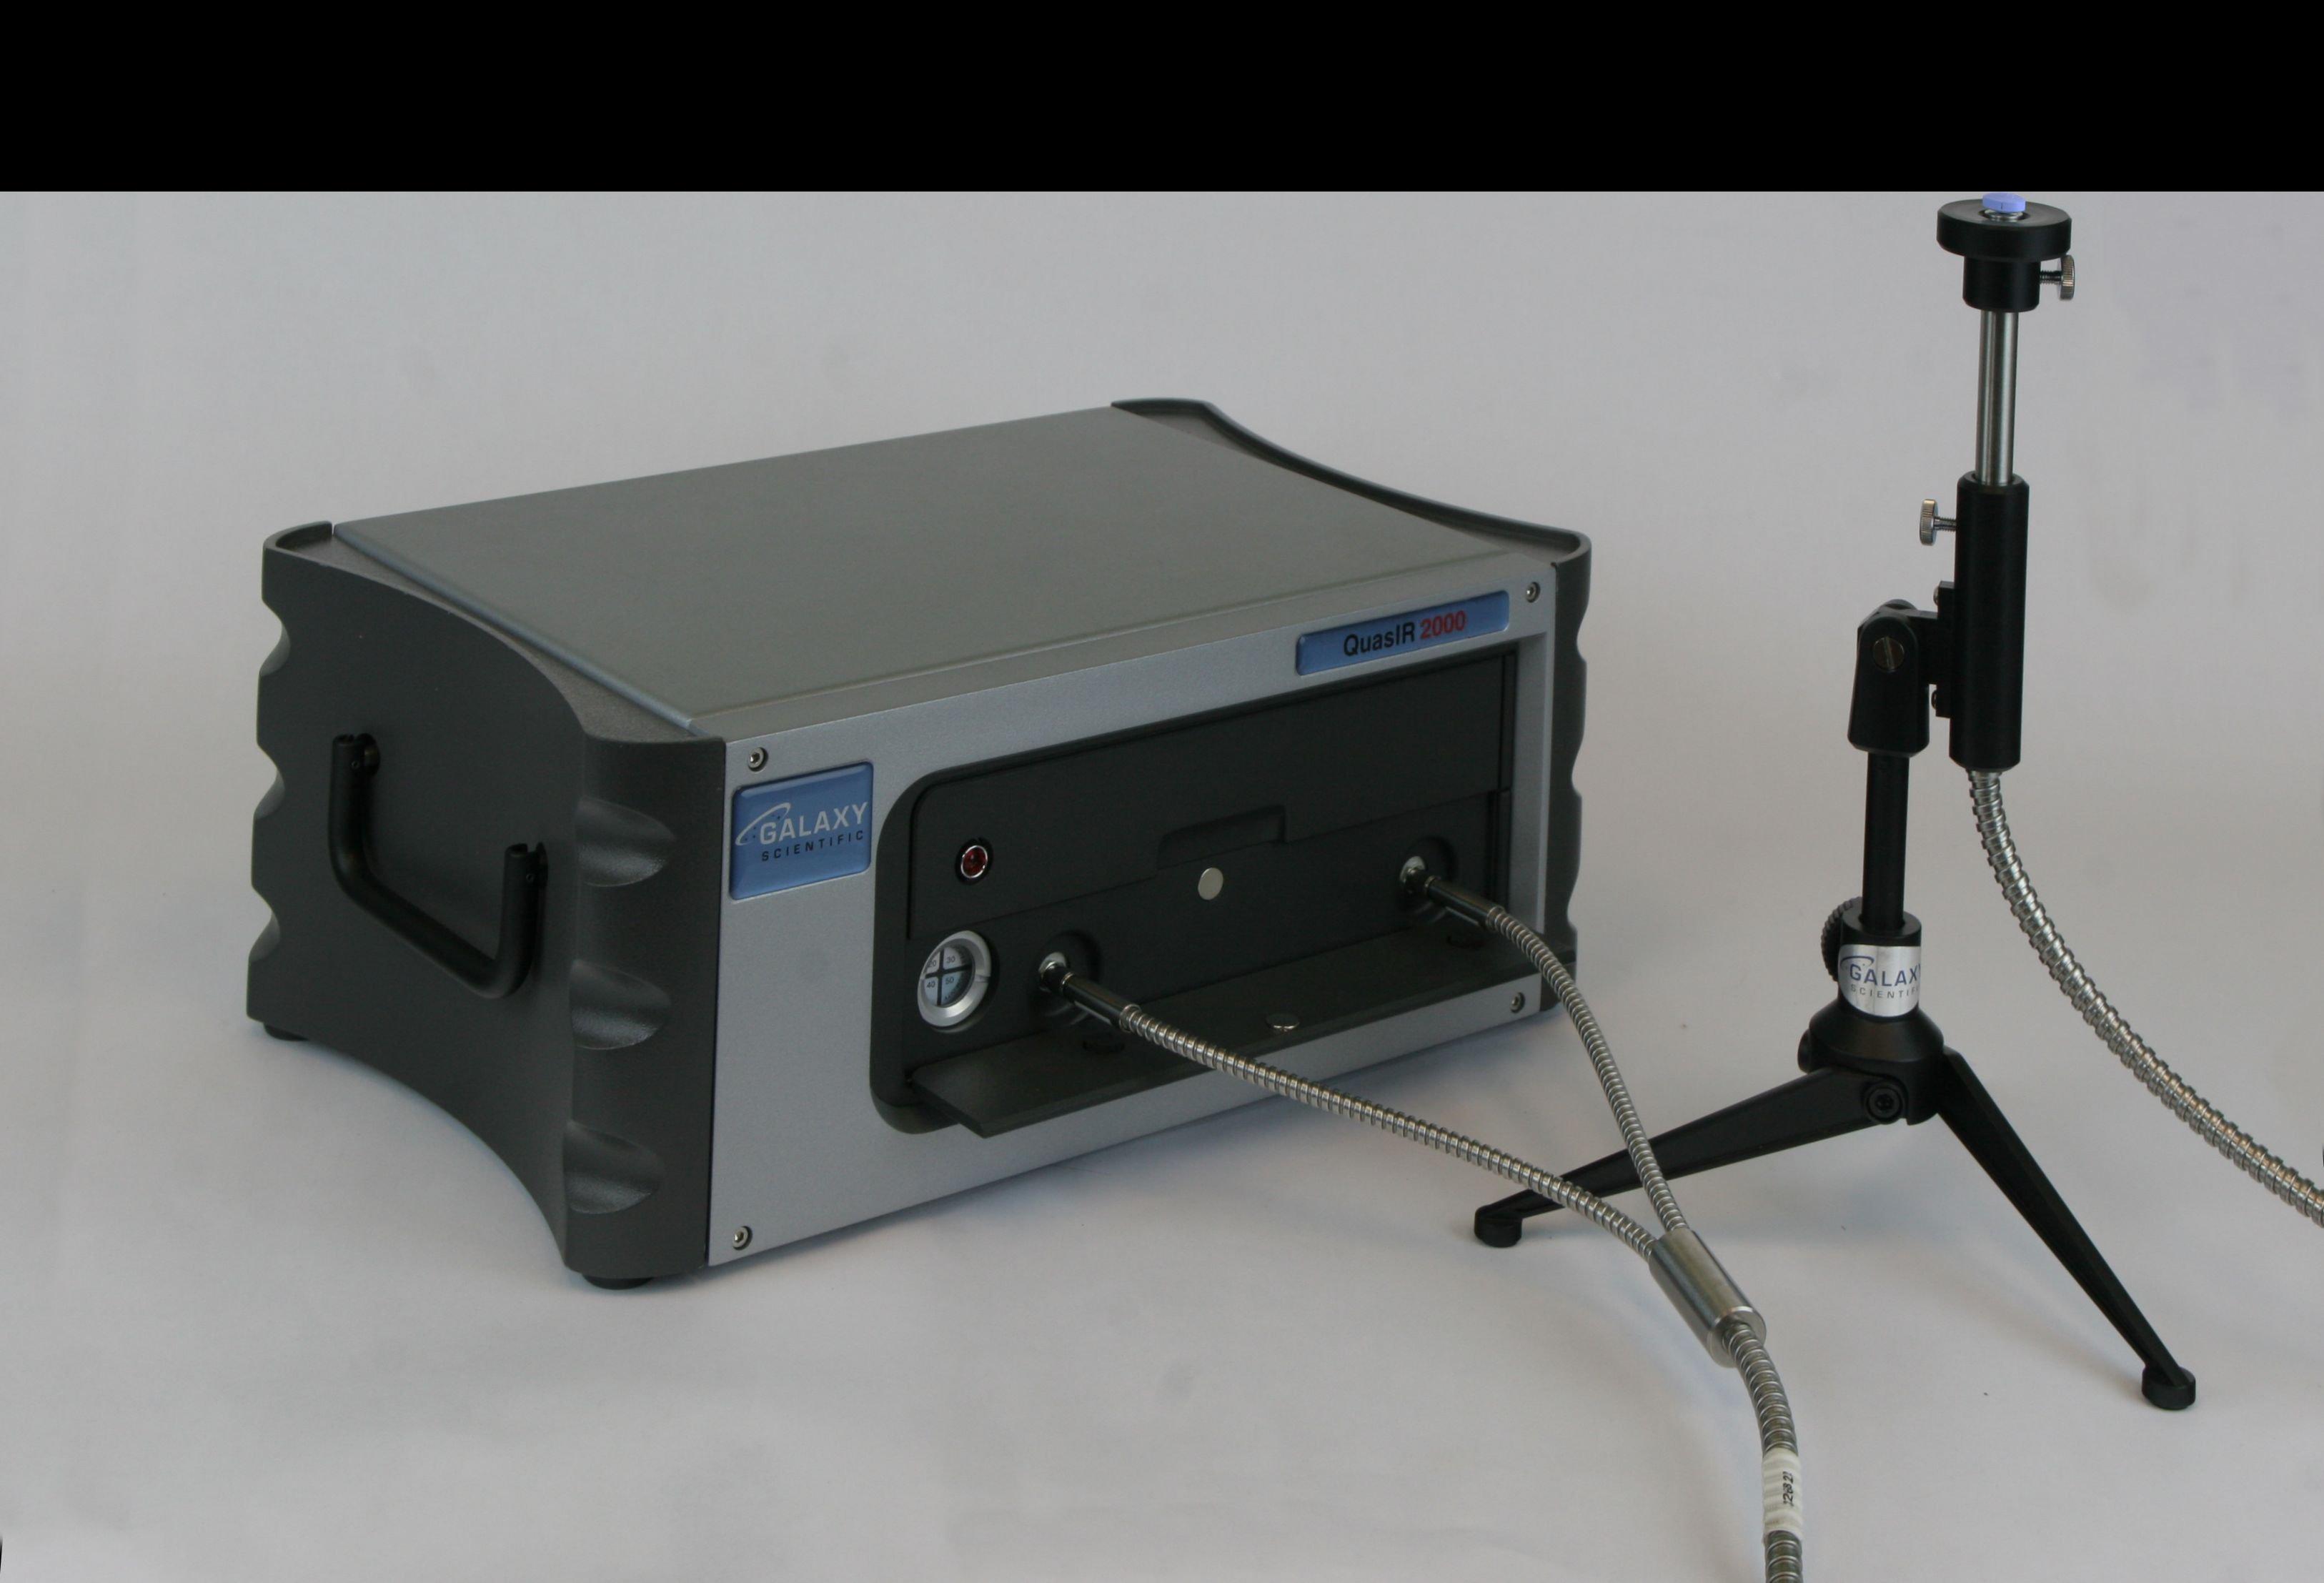 QuasIR 2000 FT-NIR with fiber optic probe and stand